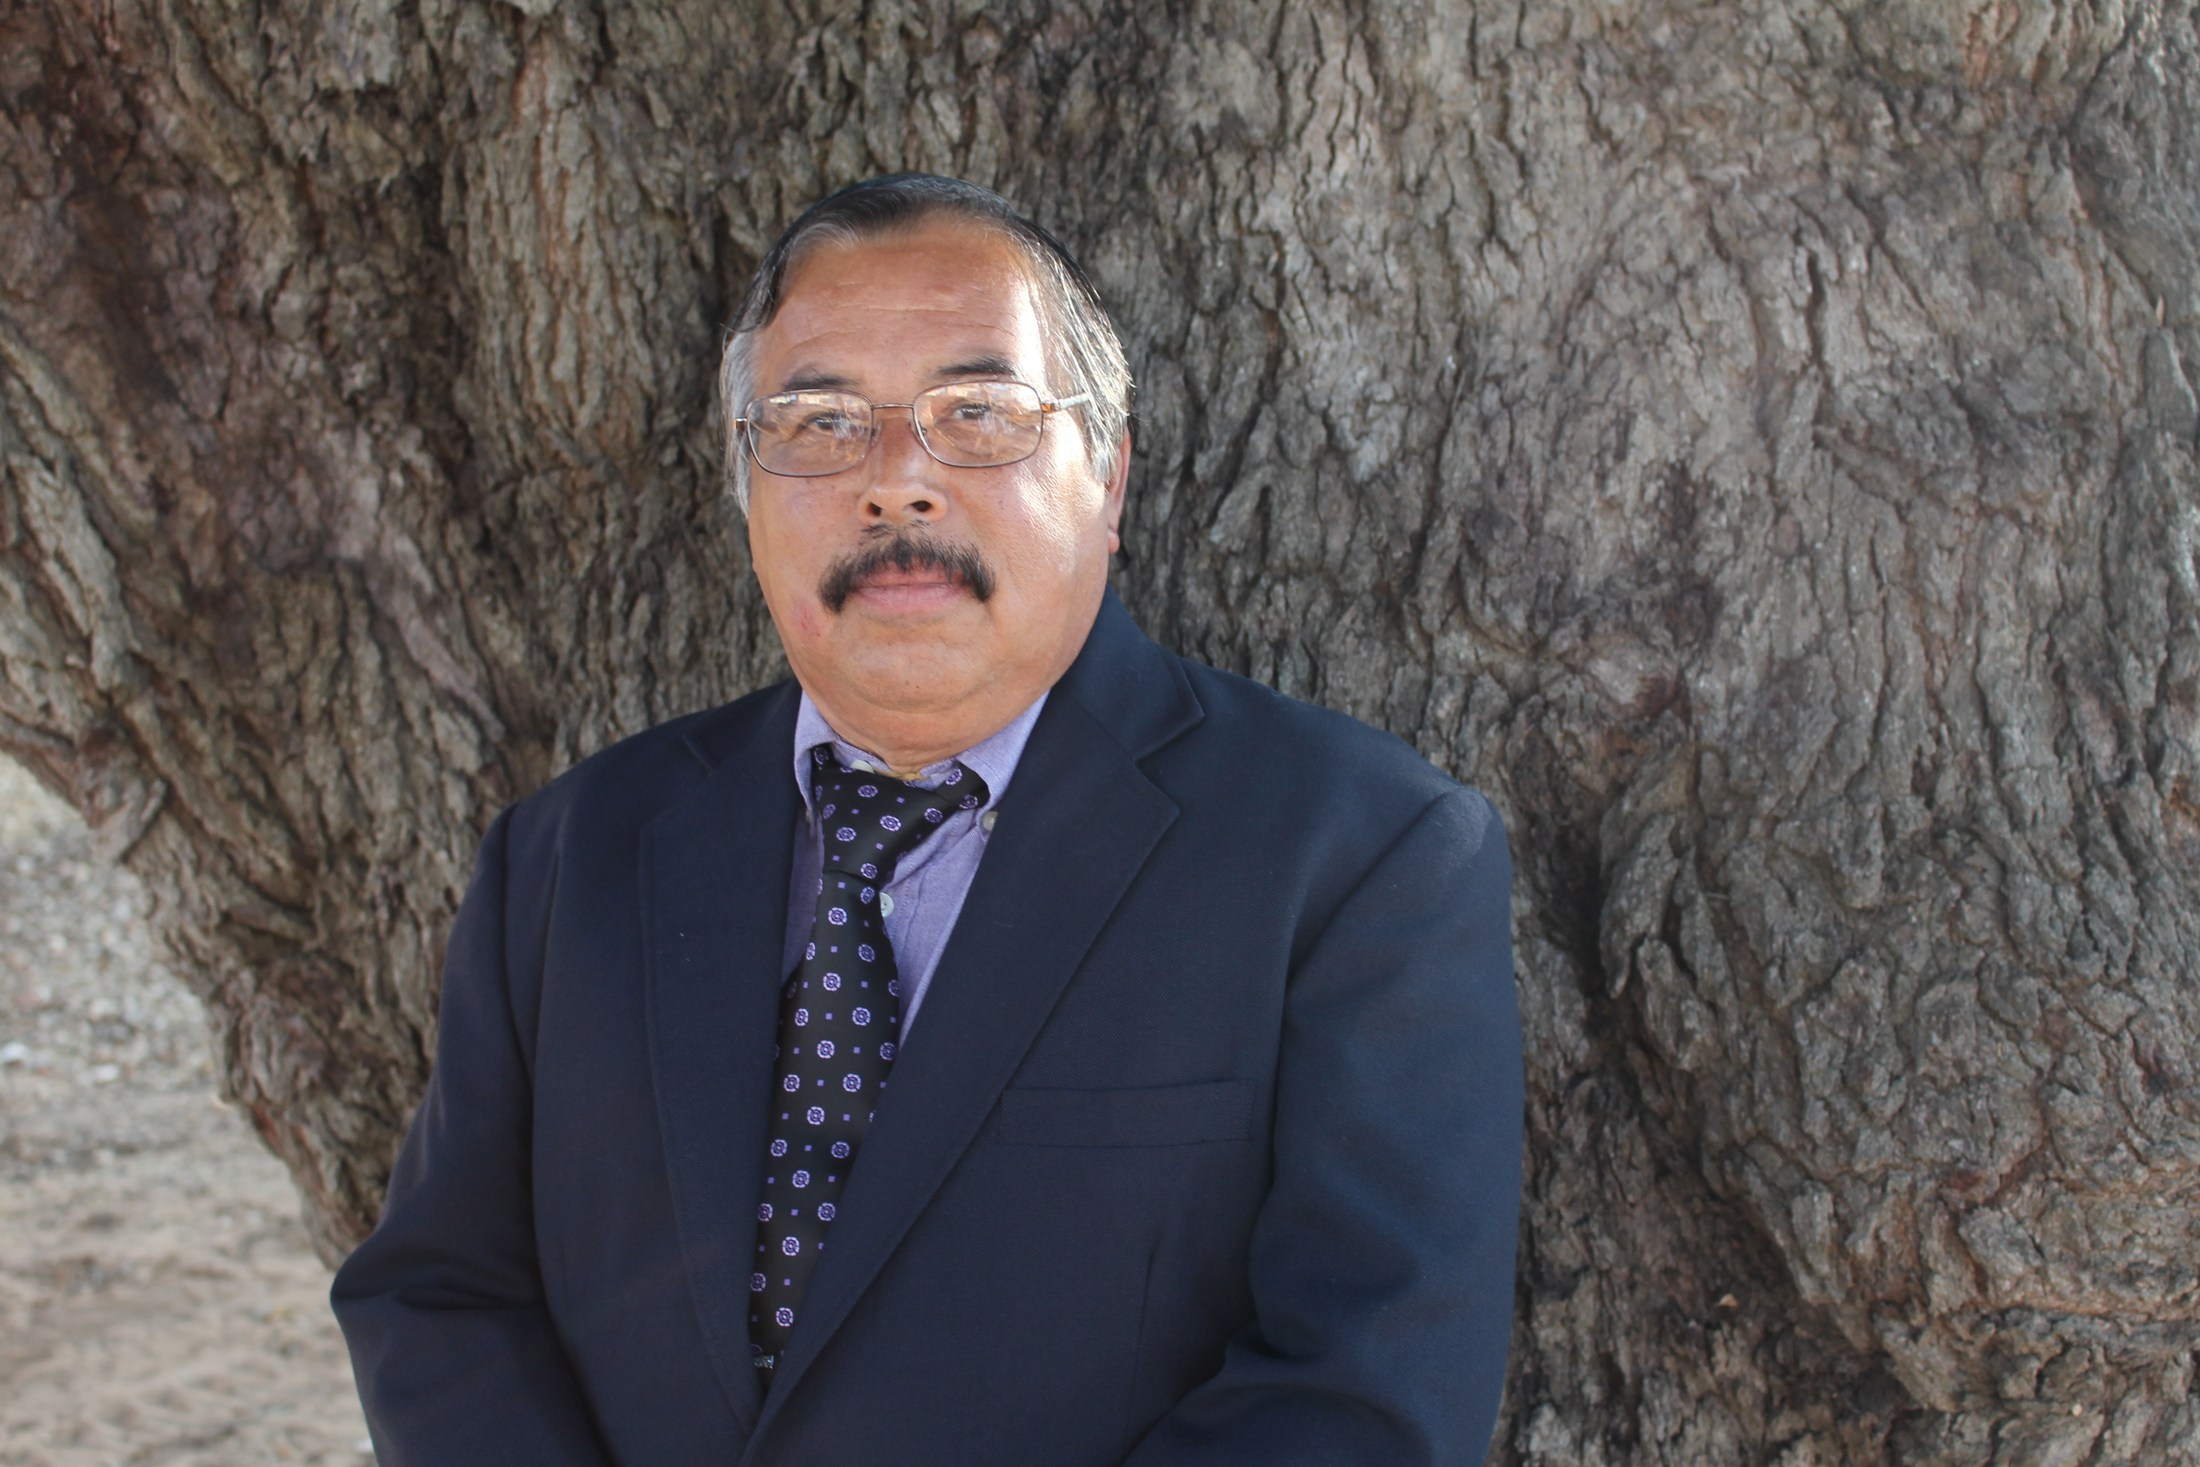 Board Trustee Edward Zamarripa District 2